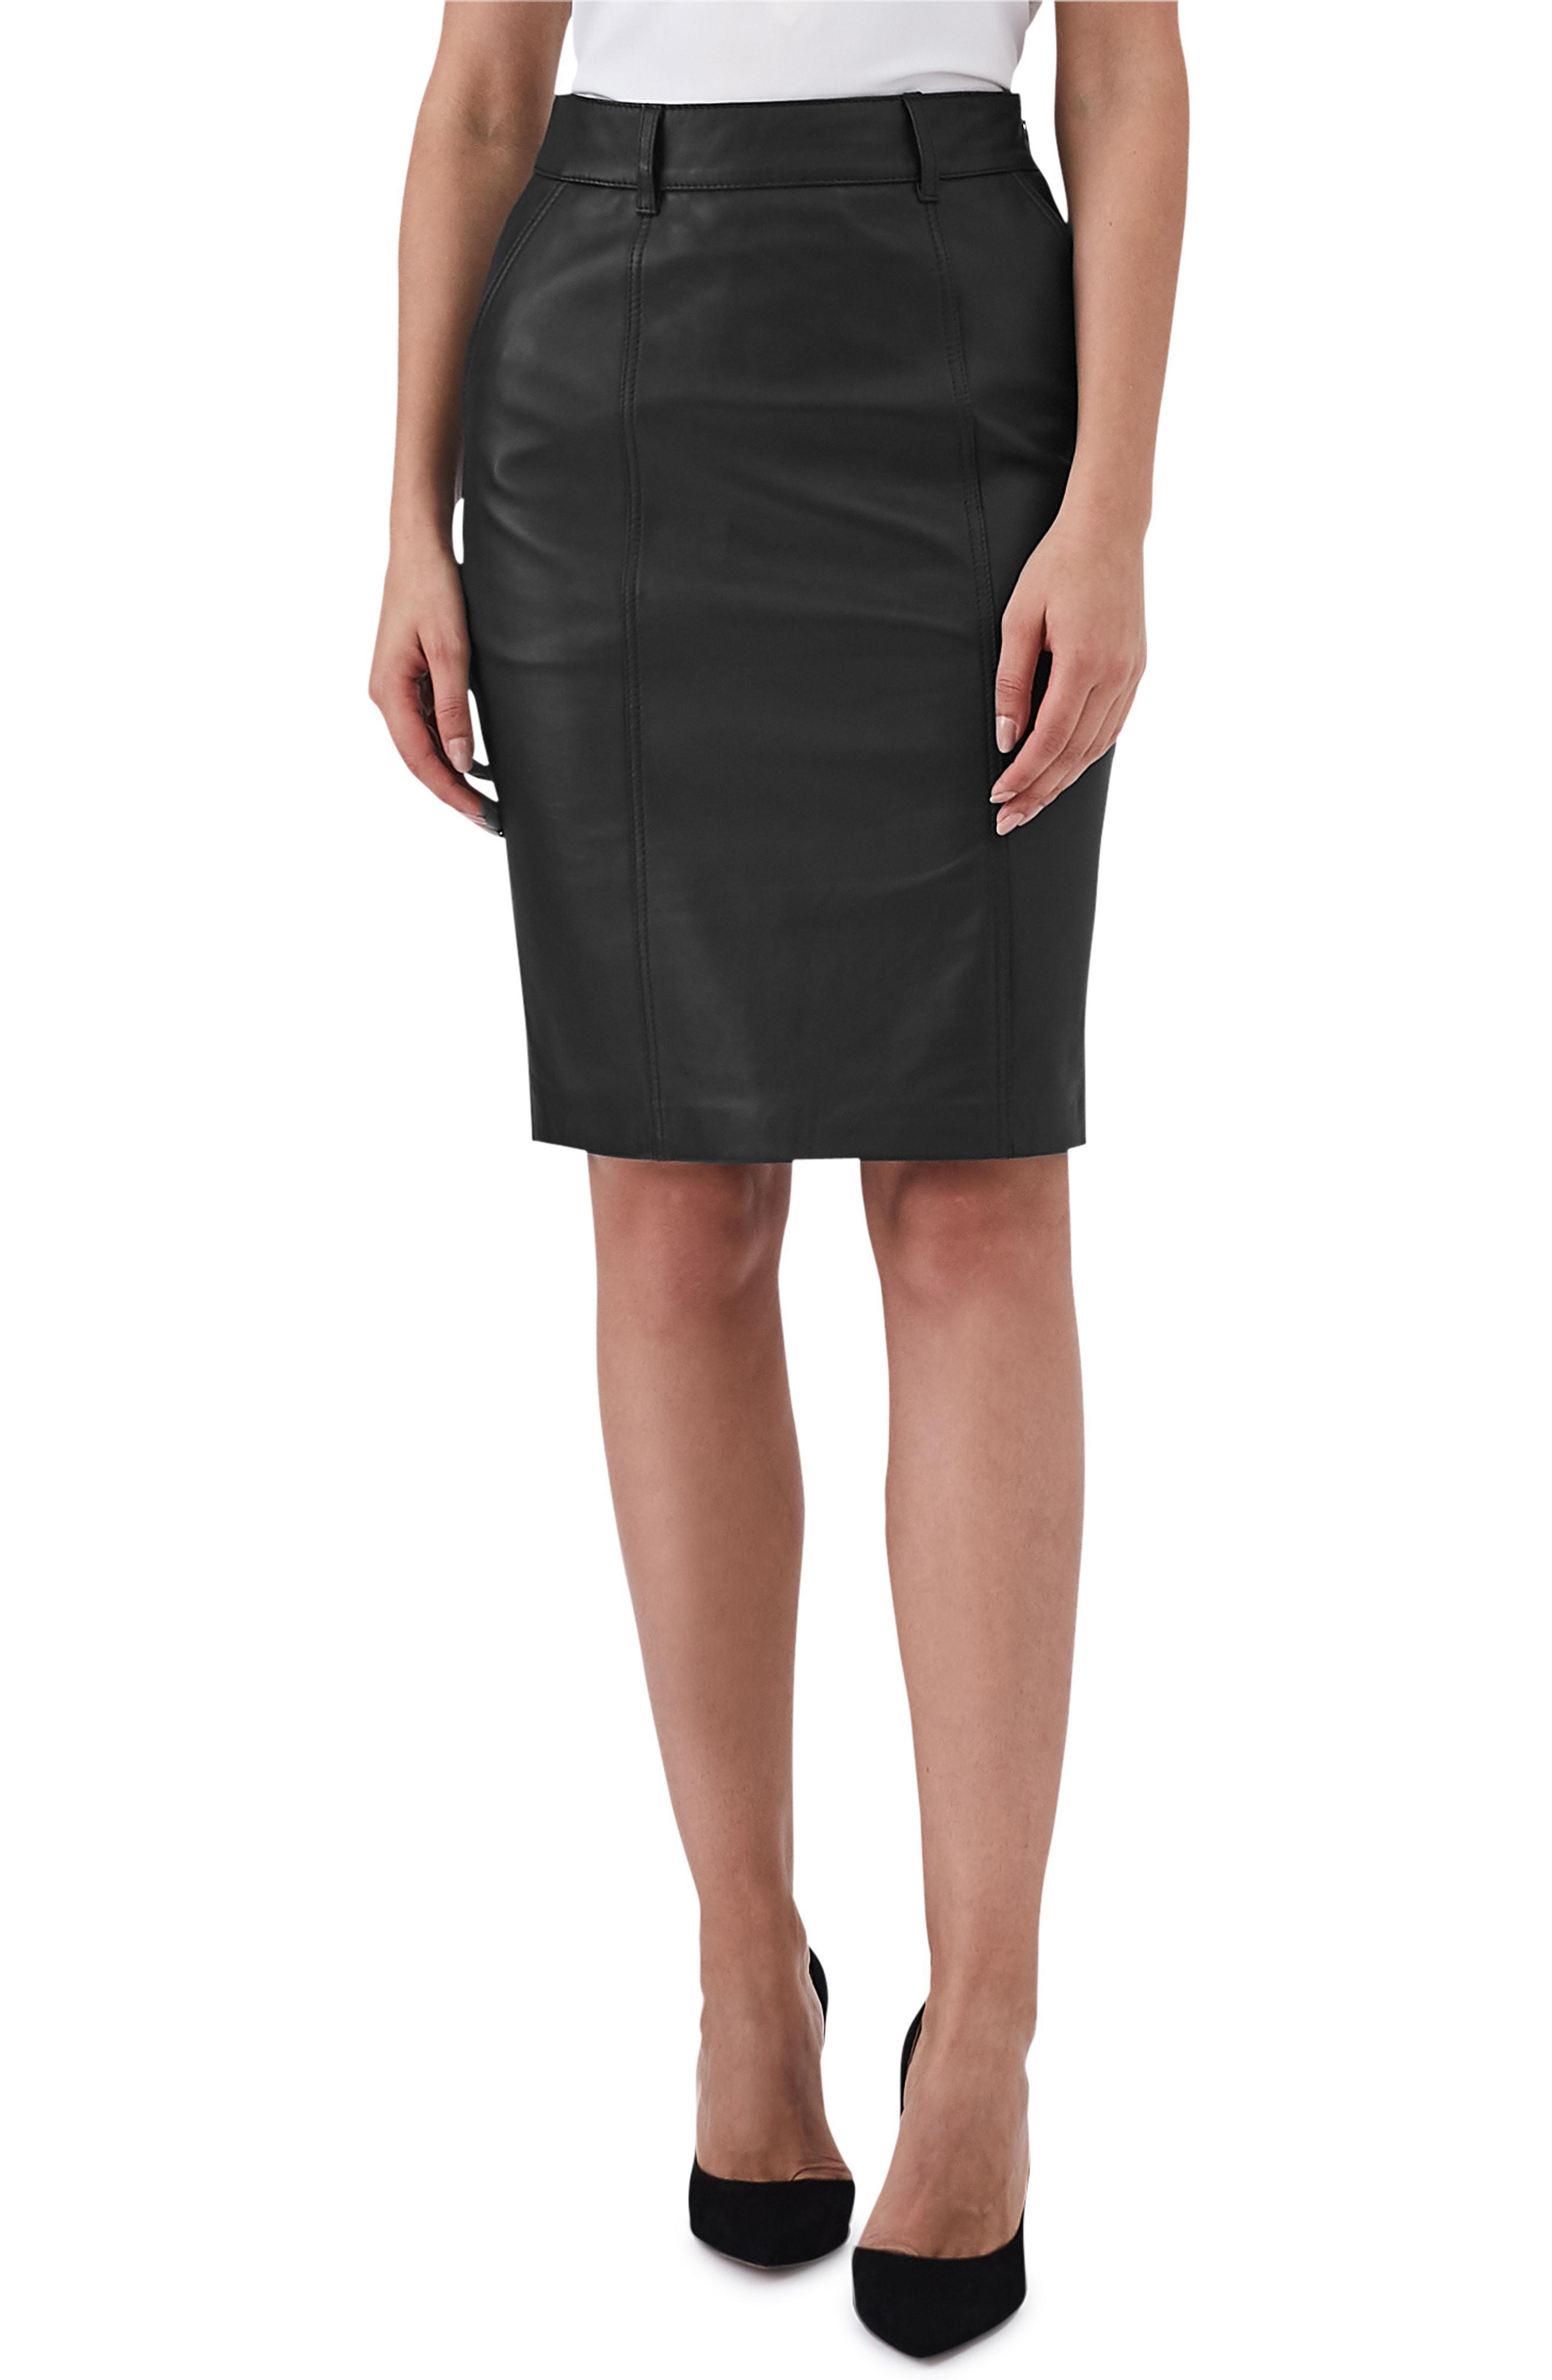 bb4c021e2f Lyst - Reiss Kara Leather Pencil Skirt in Black